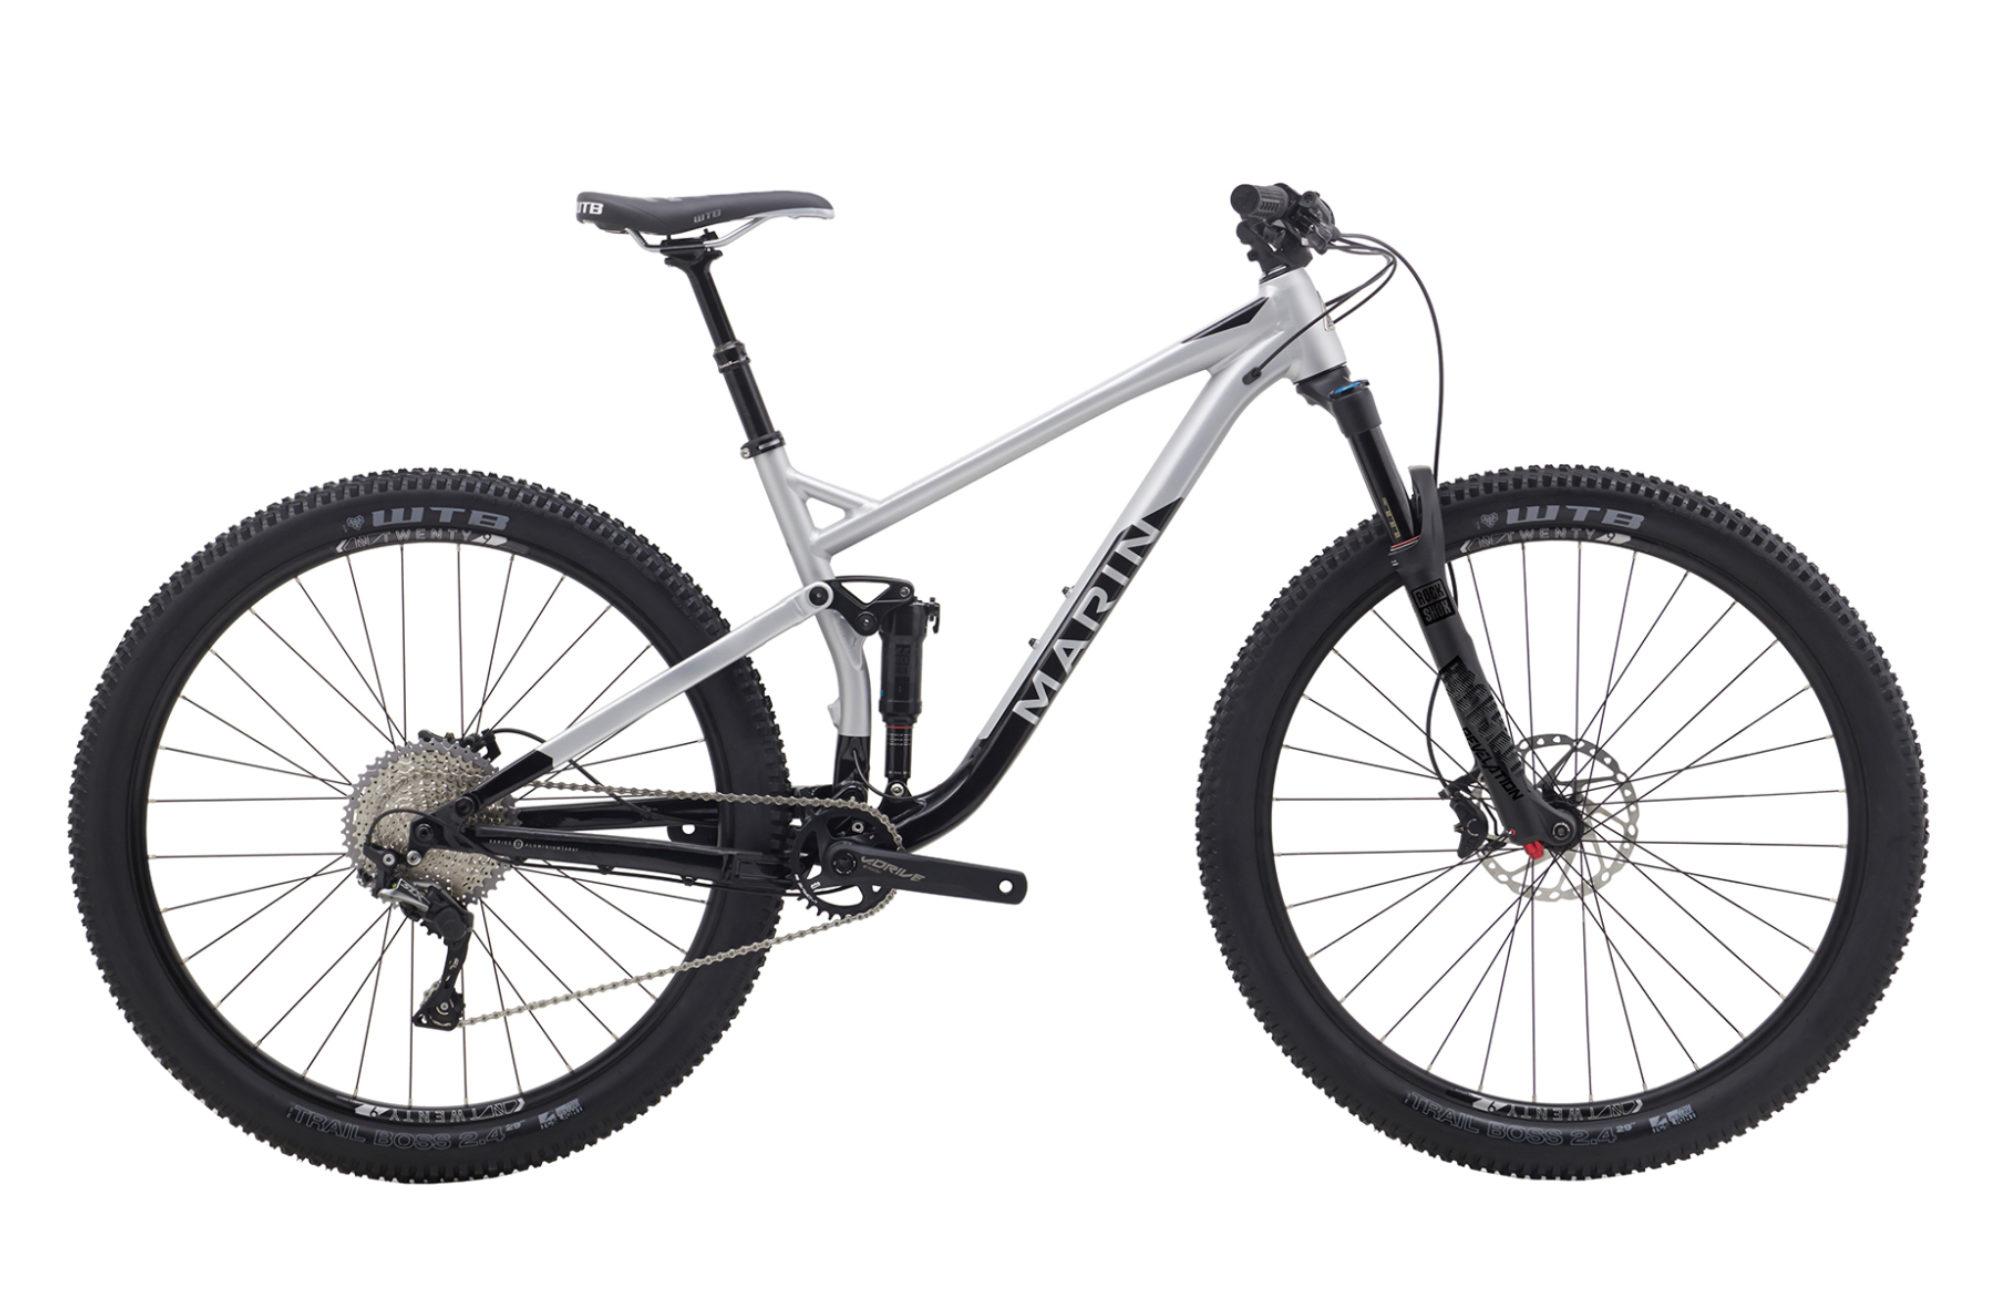 2018 Rift Zone 3 £2300